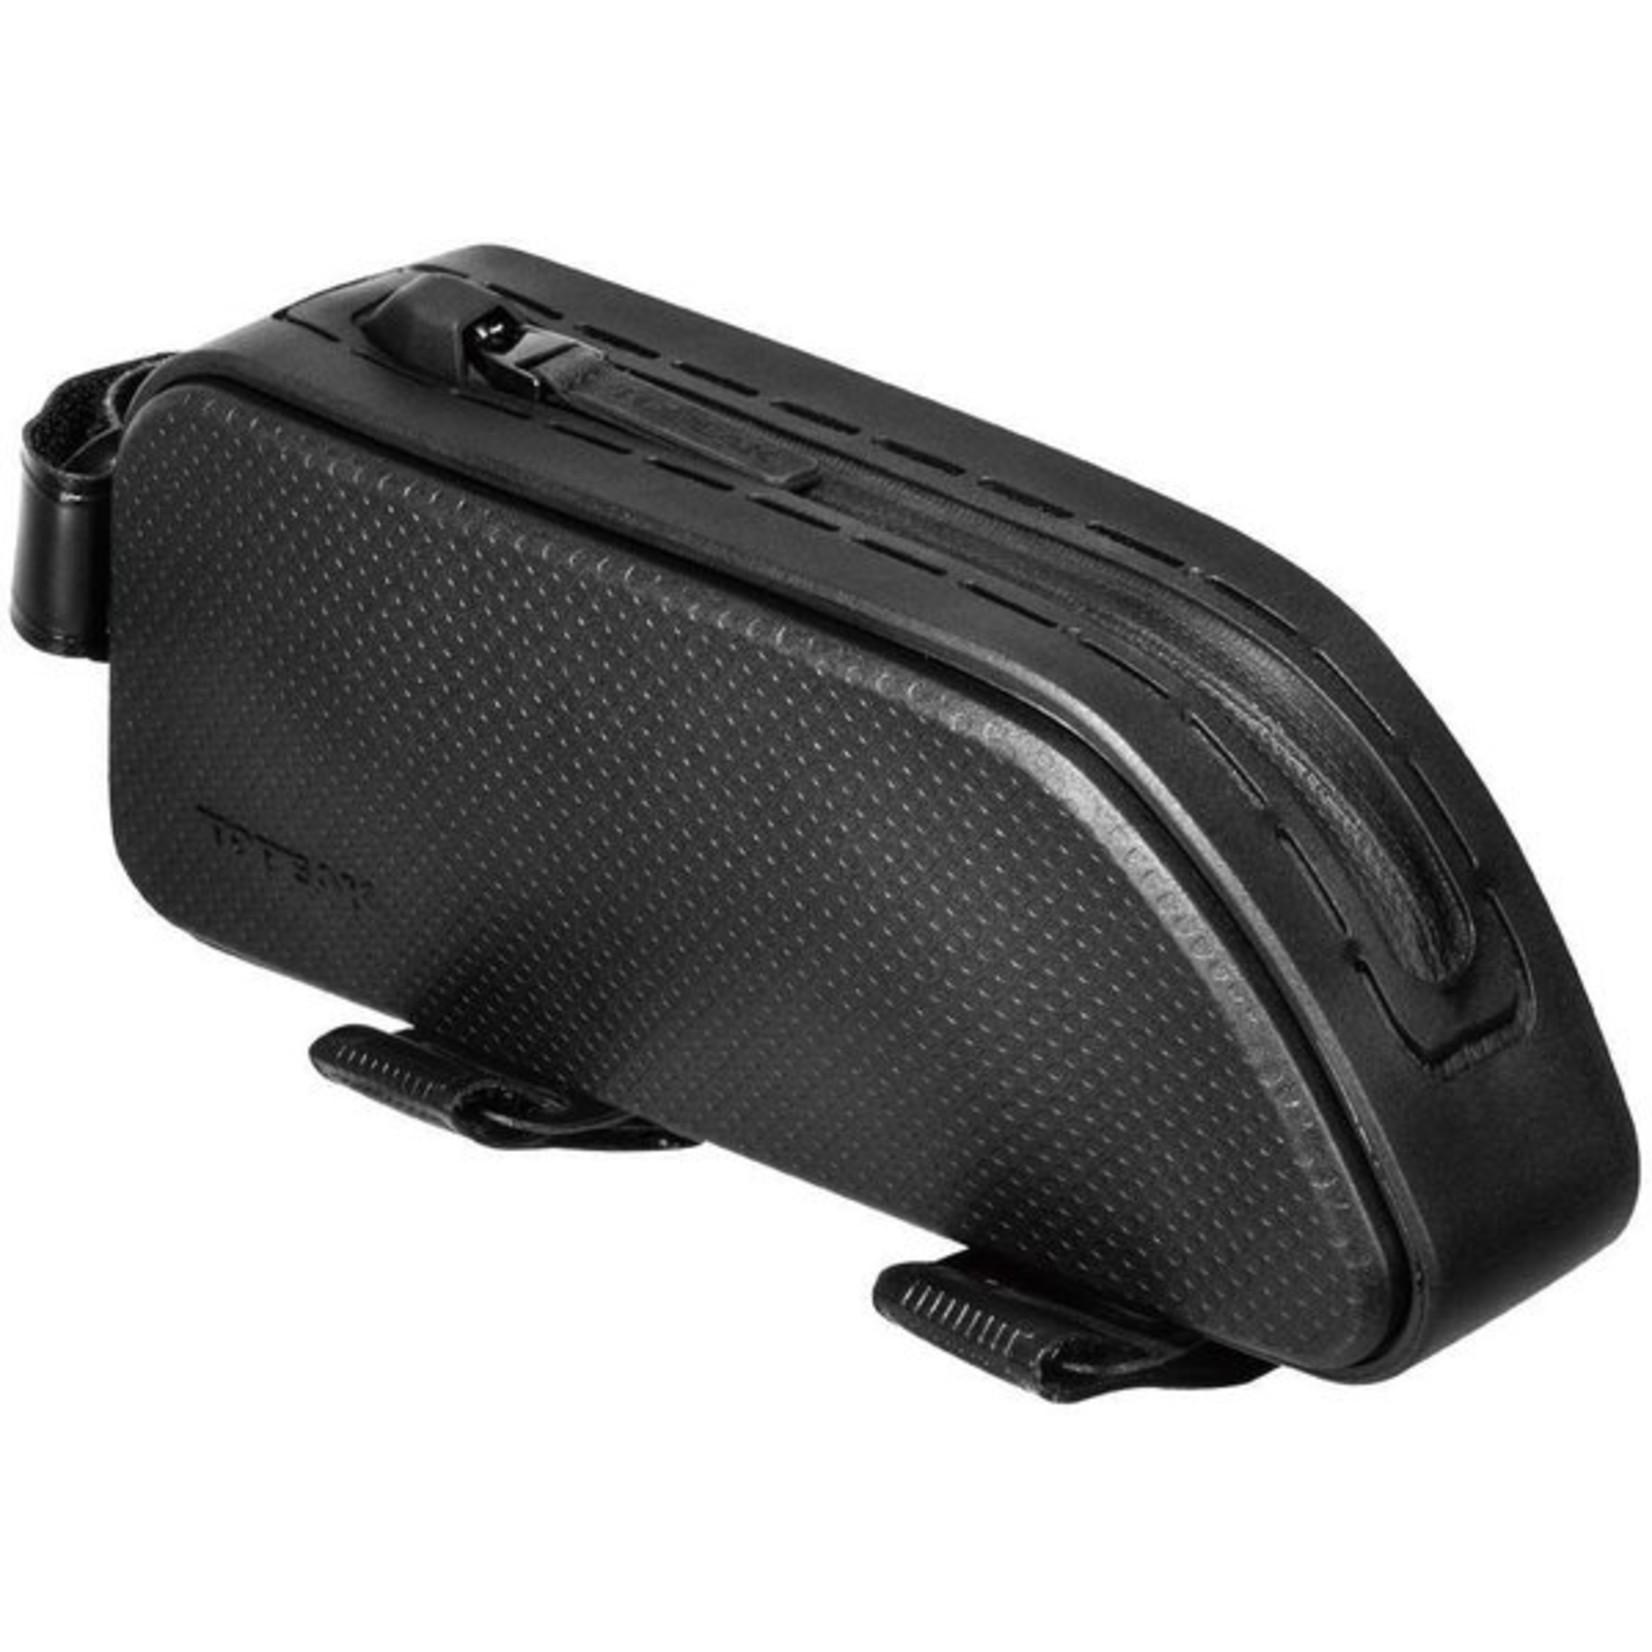 Topeak Topeak Fastfuel Drybag X Top Tube Bag